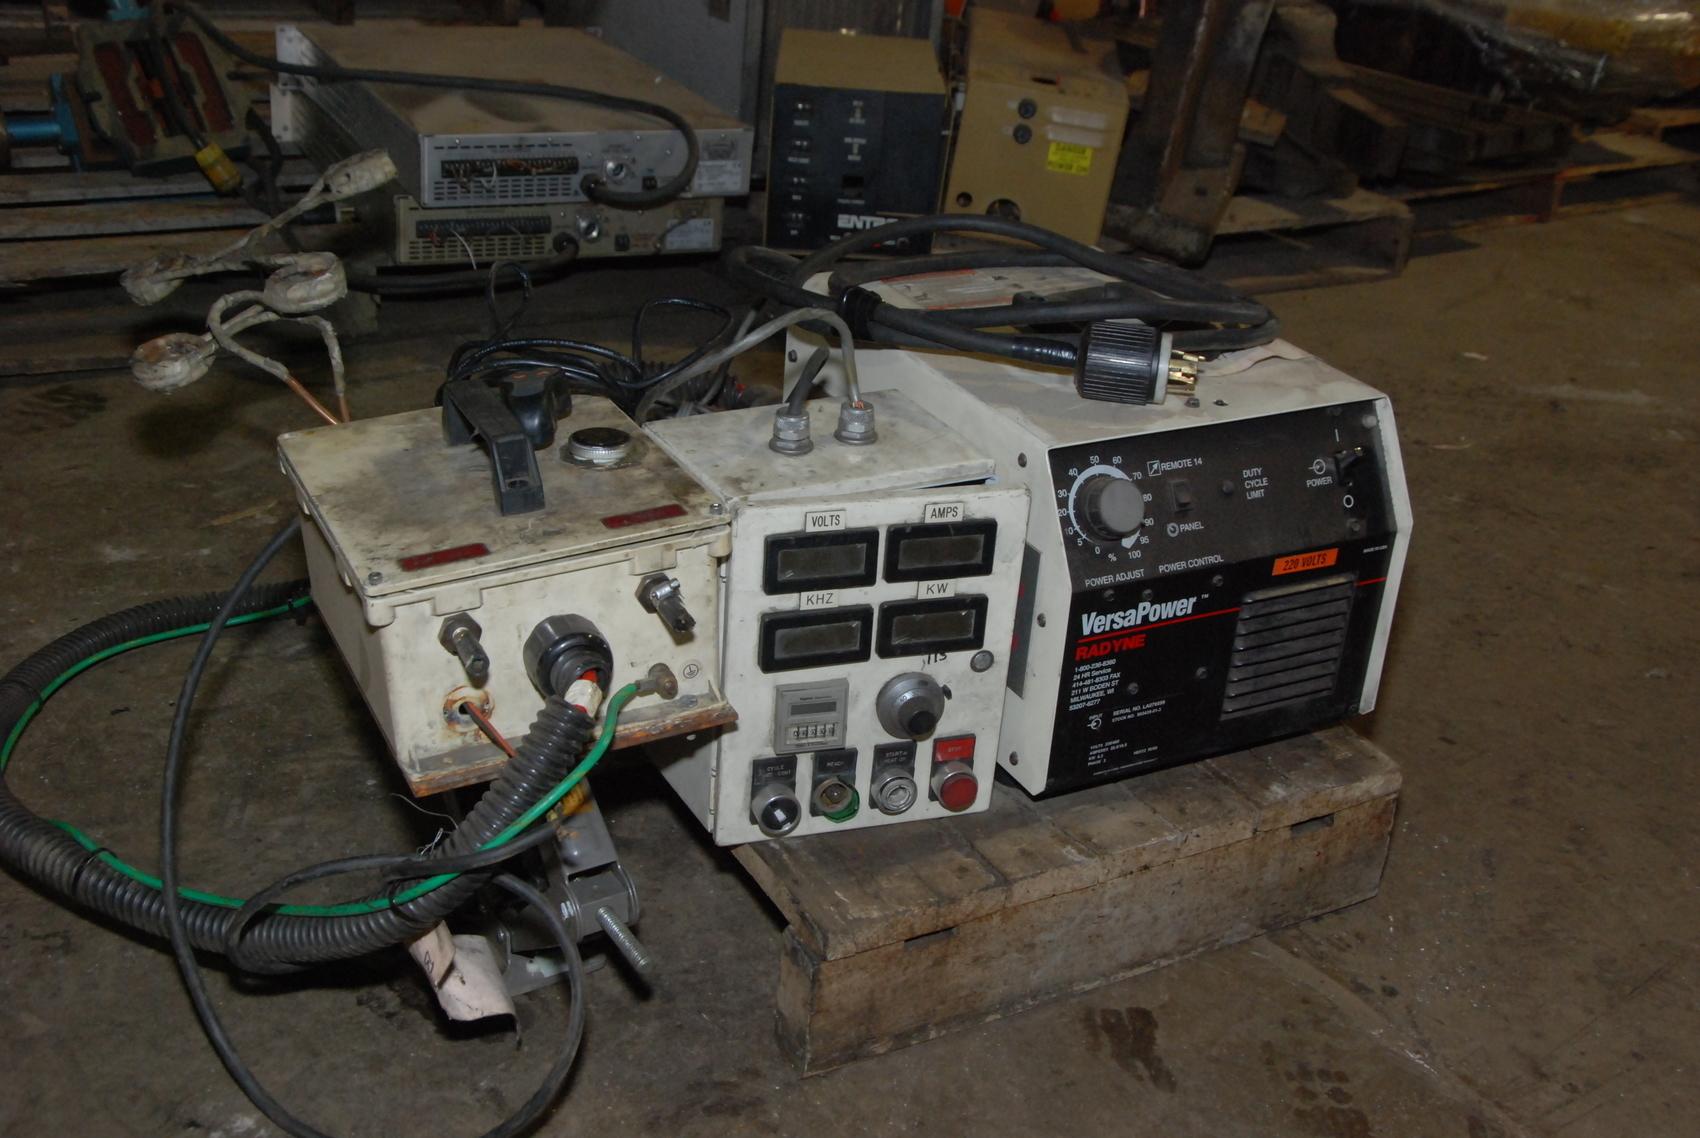 Radyne Model Versa Power 6.3 kW Induction Heater,3 PHASE,230/460V